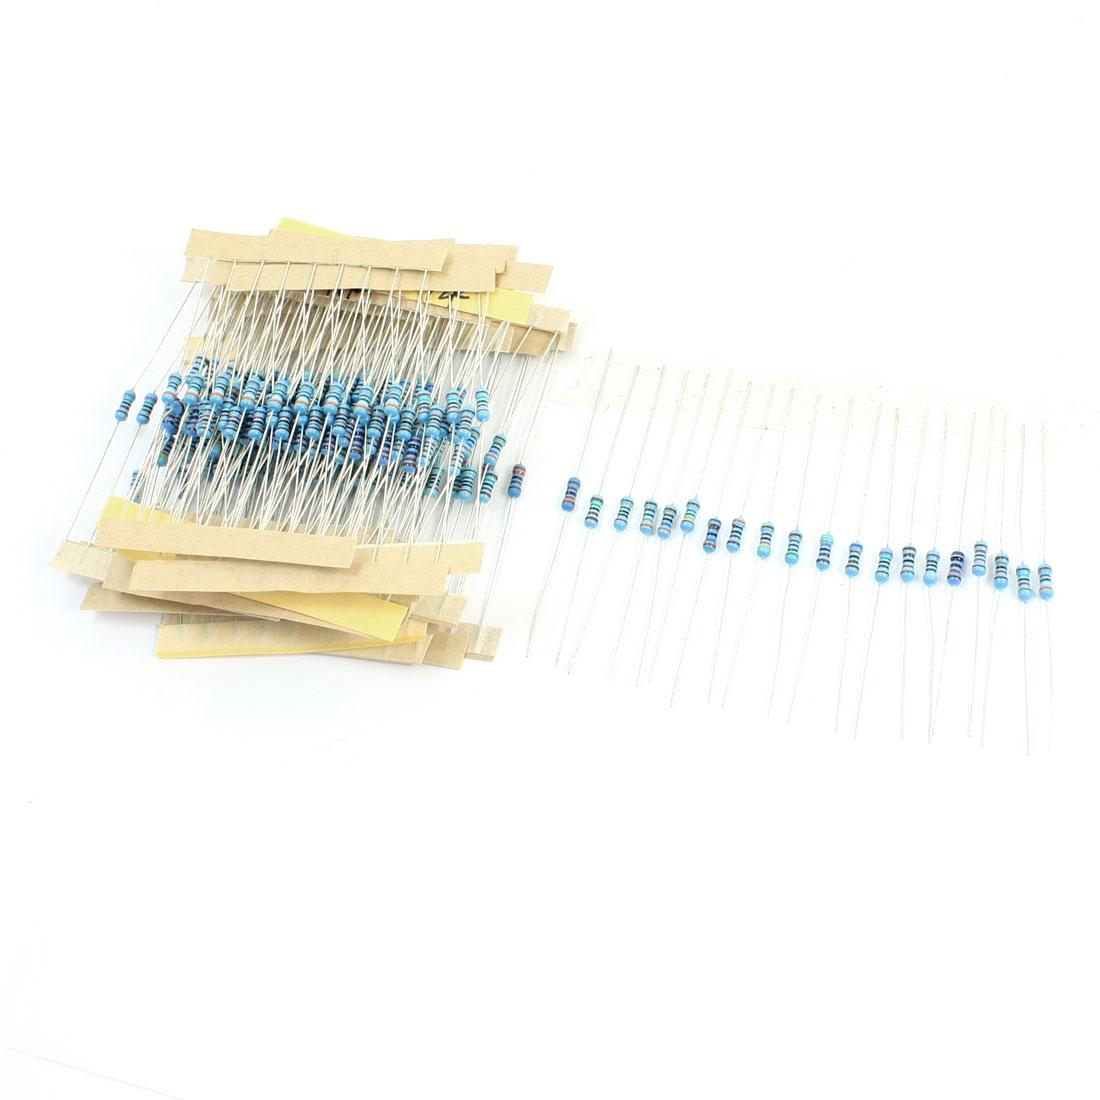 200pcs 20 Values 1.5K-18K Ohm 1% Tolerance 1/4W Metal Film Resistors